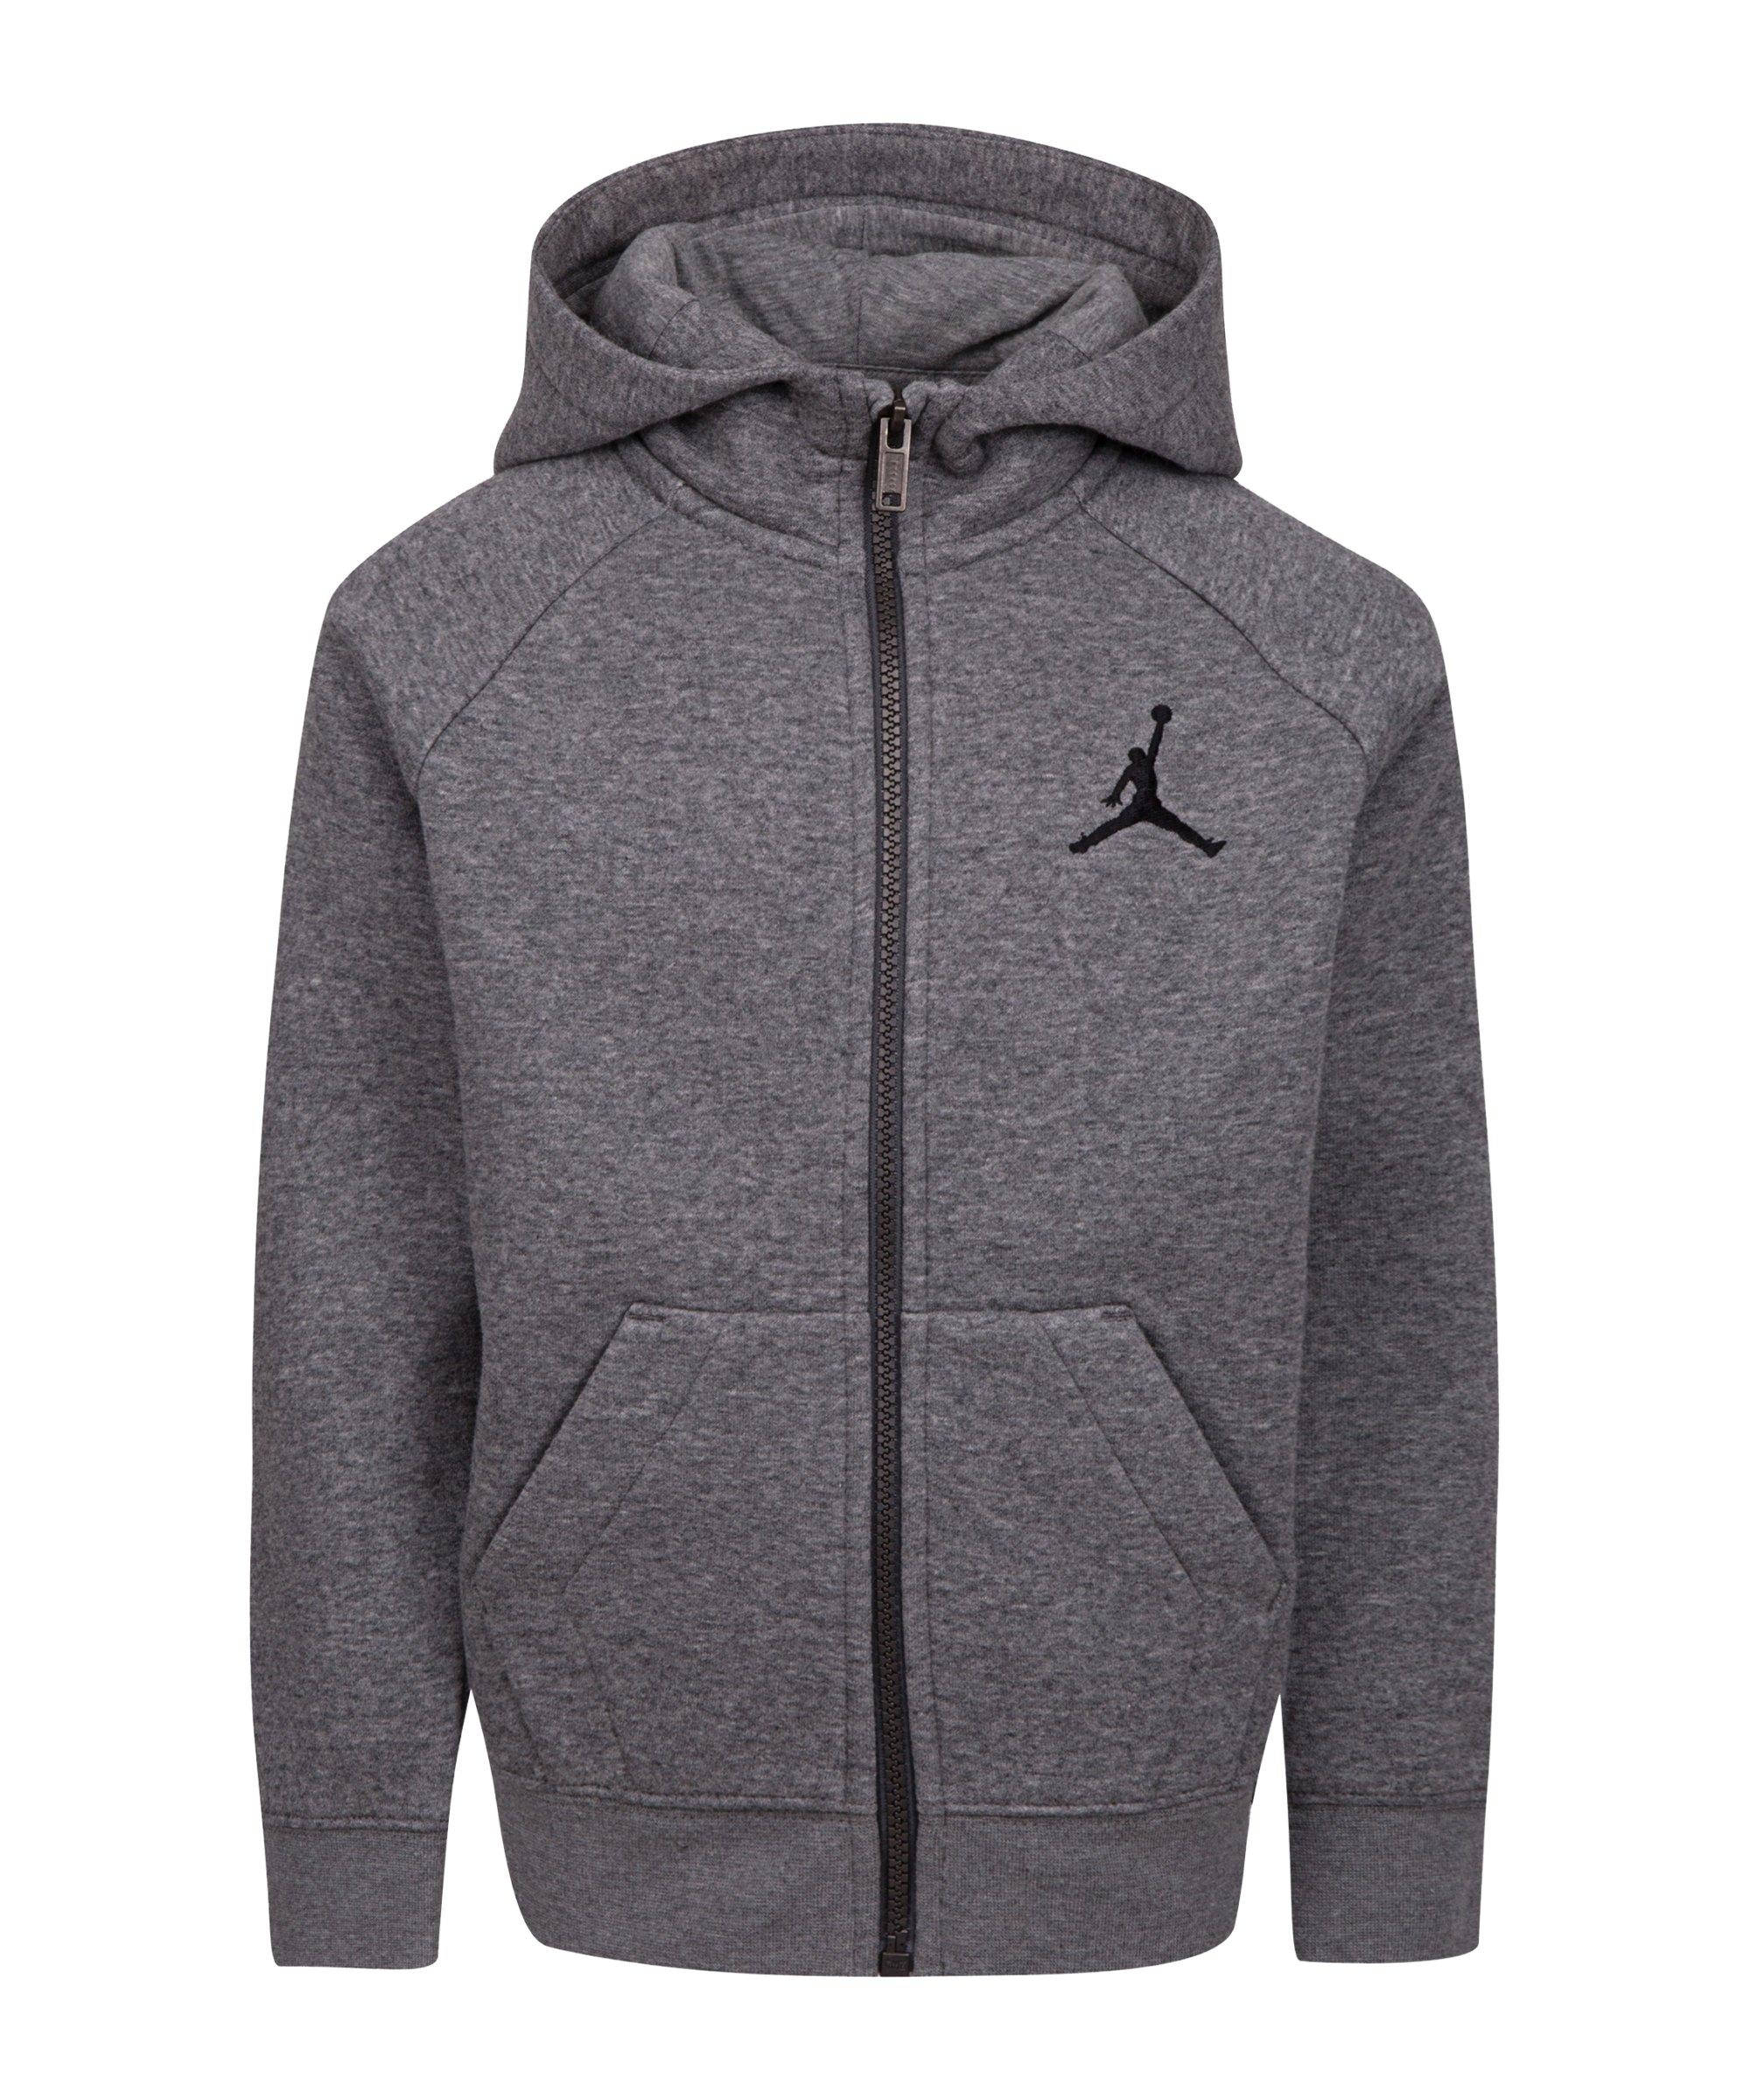 Nike Jumpman Kapuzenjacke Kids Grau FGEH - grau